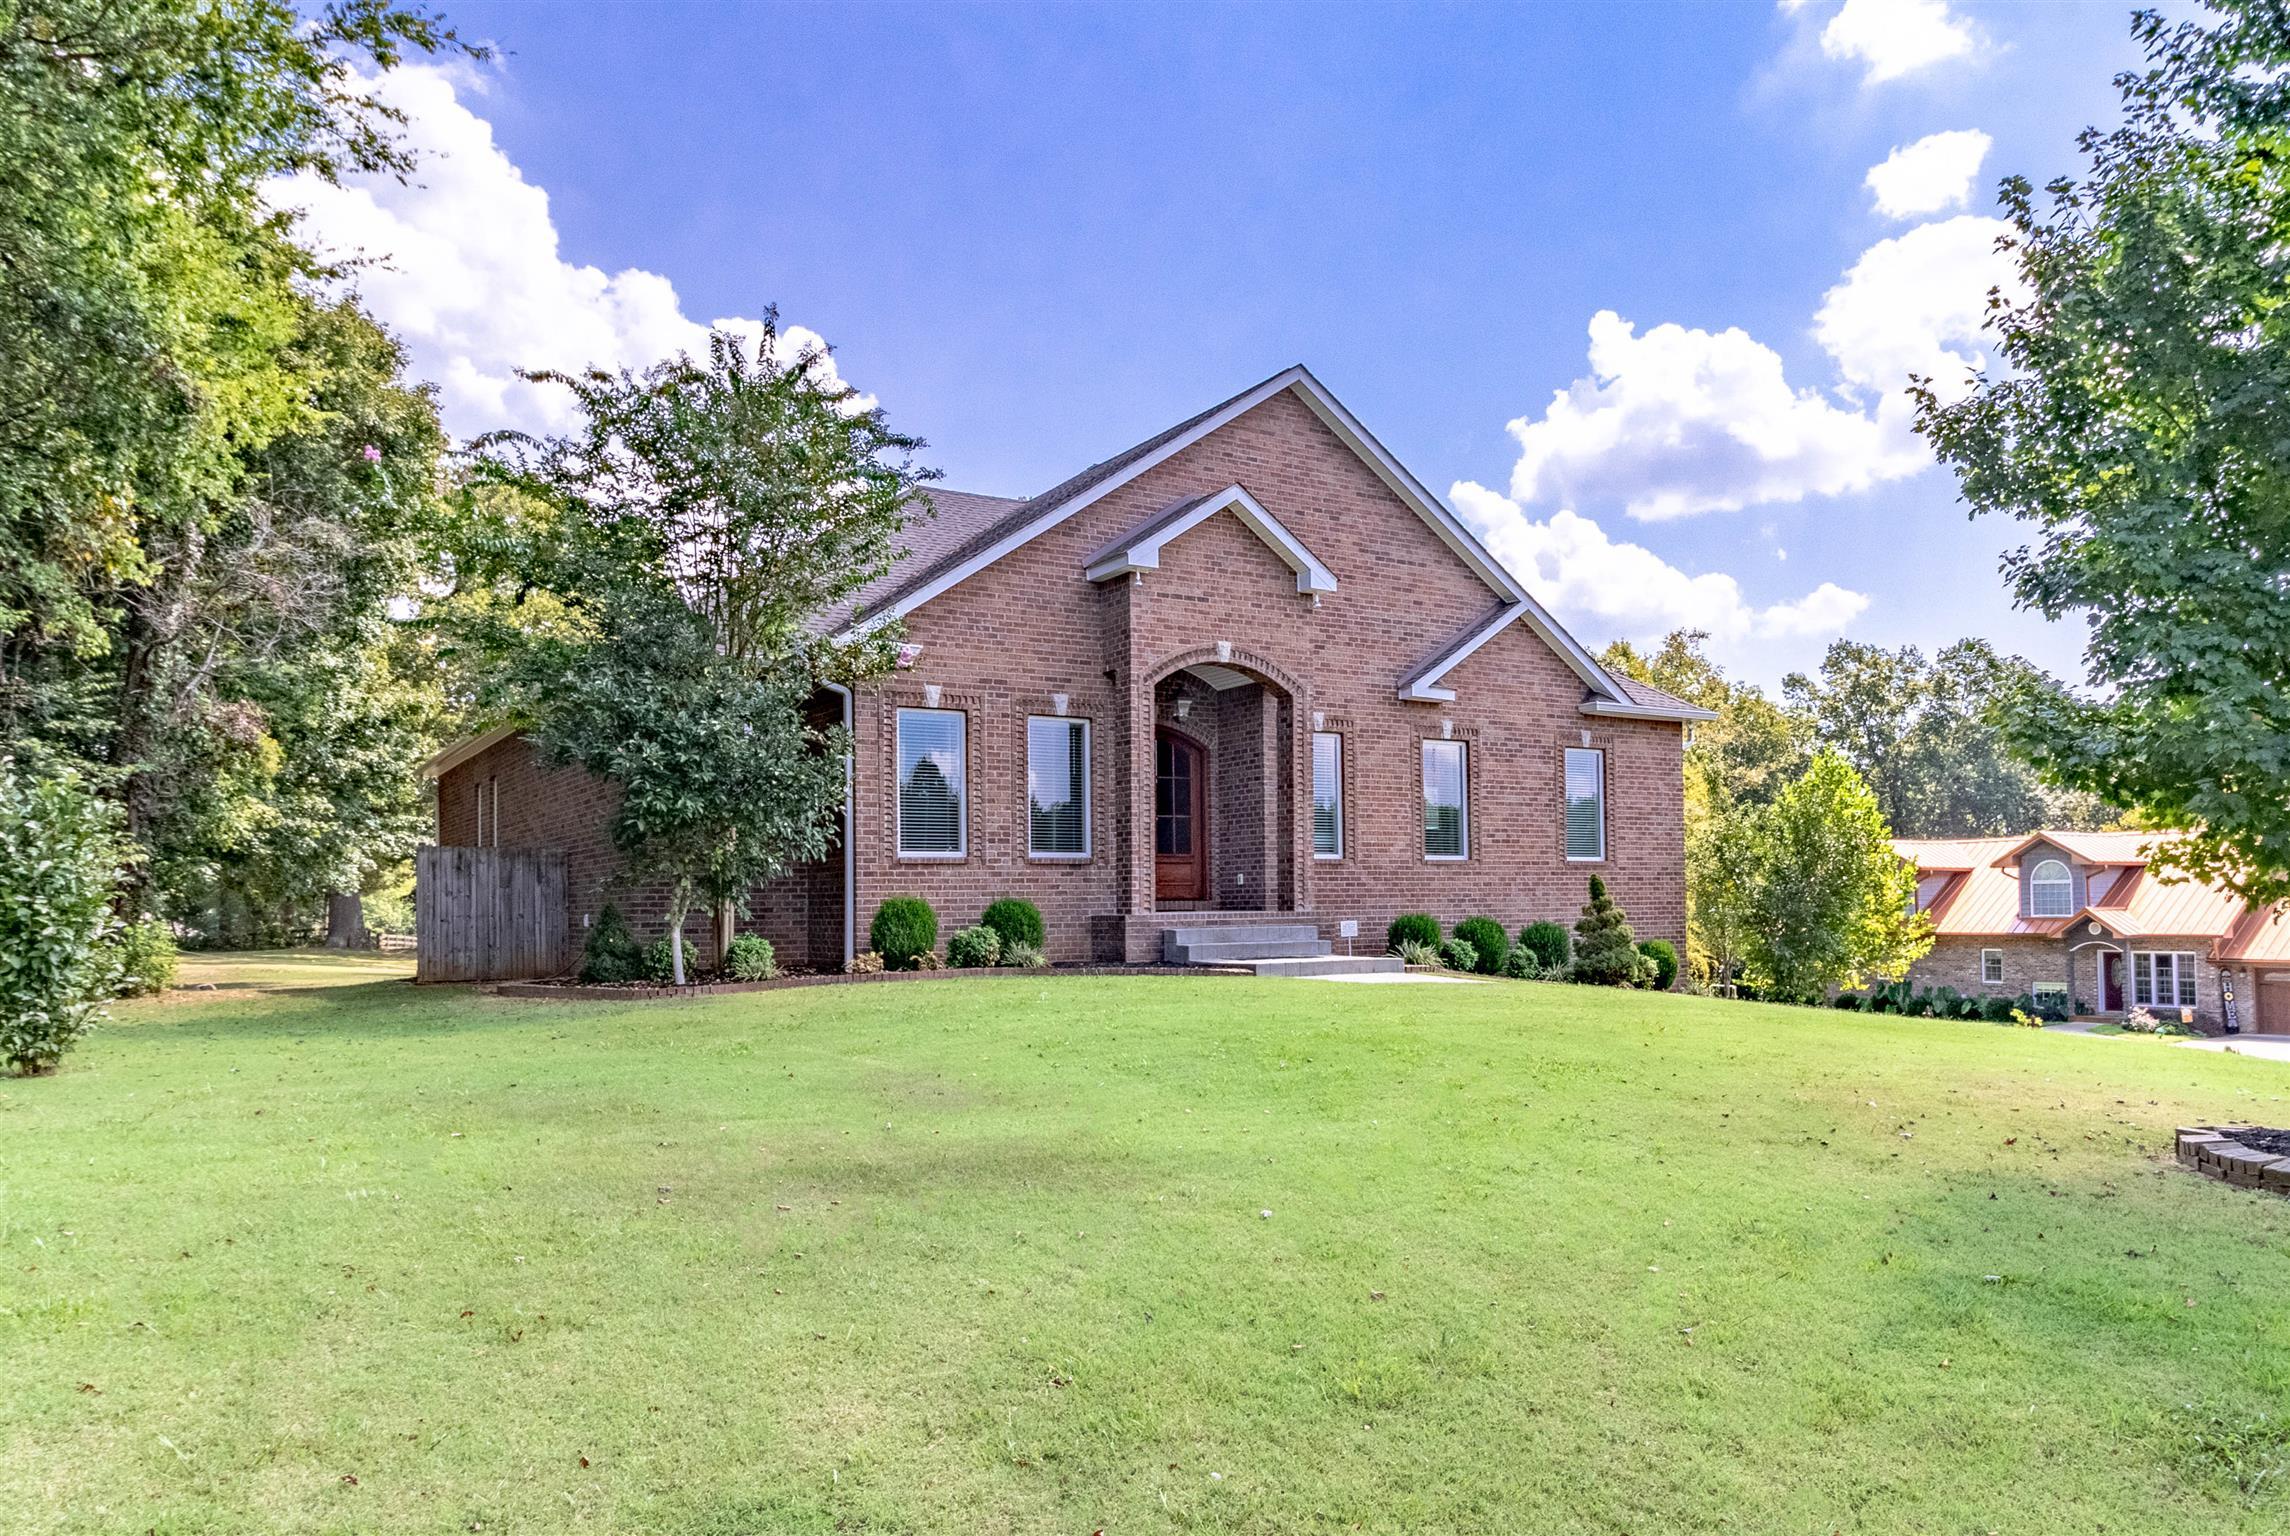 307 Dirks Pl, Clarksville, TN 37043 - Clarksville, TN real estate listing